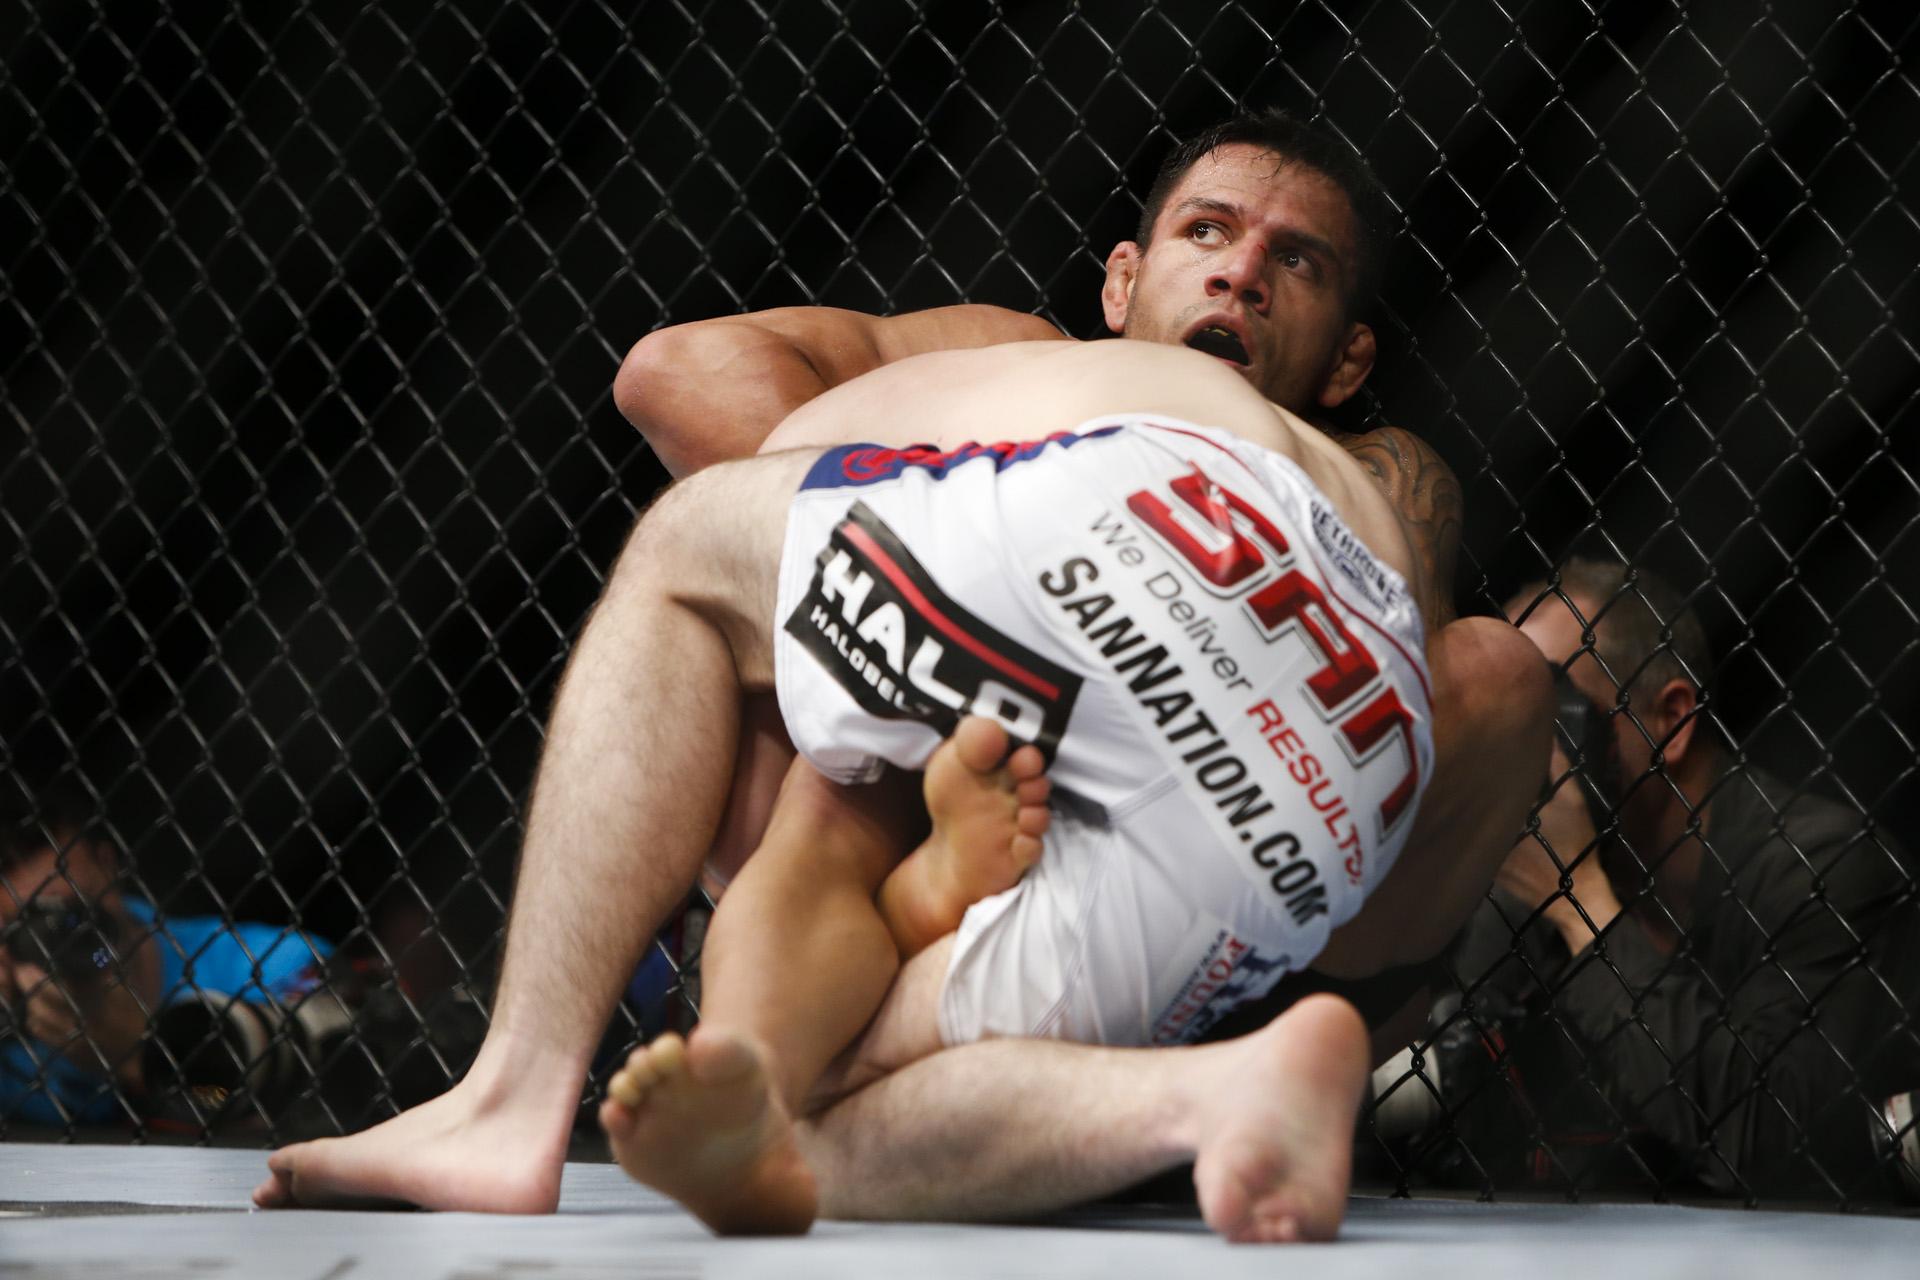 Gallery Photo: UFC on FOX 11 photos